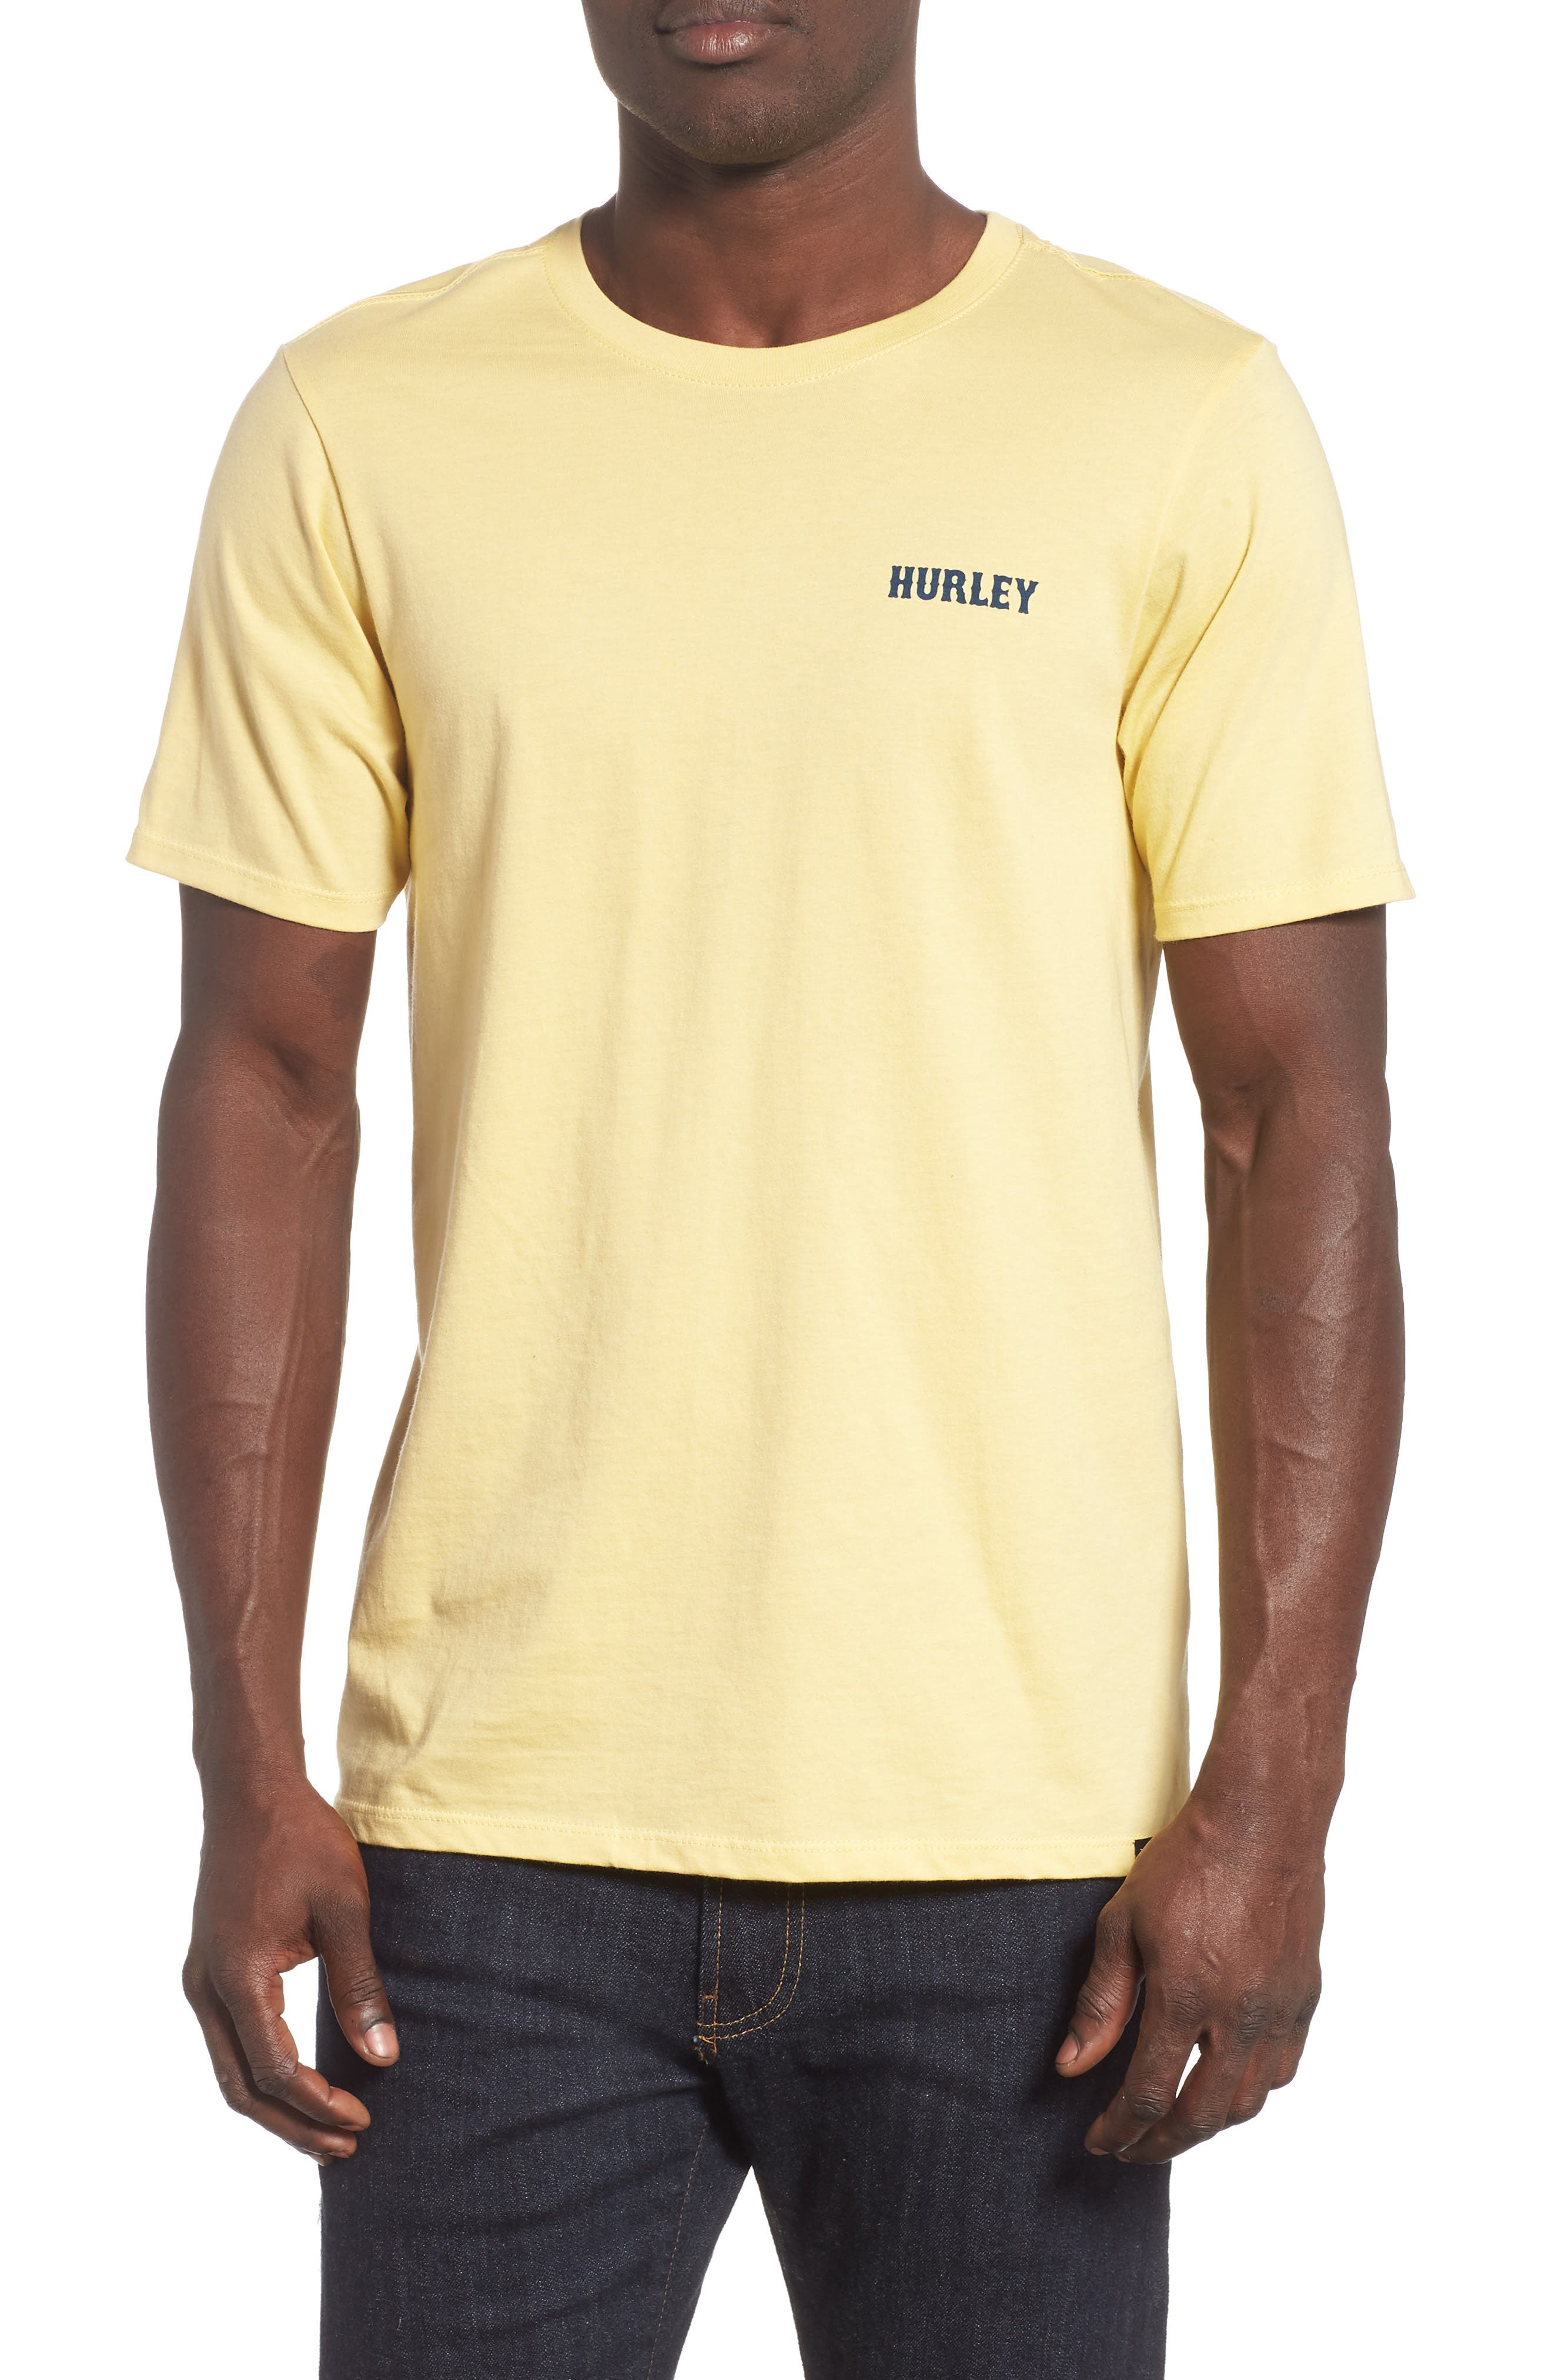 HURLEY Tree Hugger Graphic T-Shirt in Lemon Wash